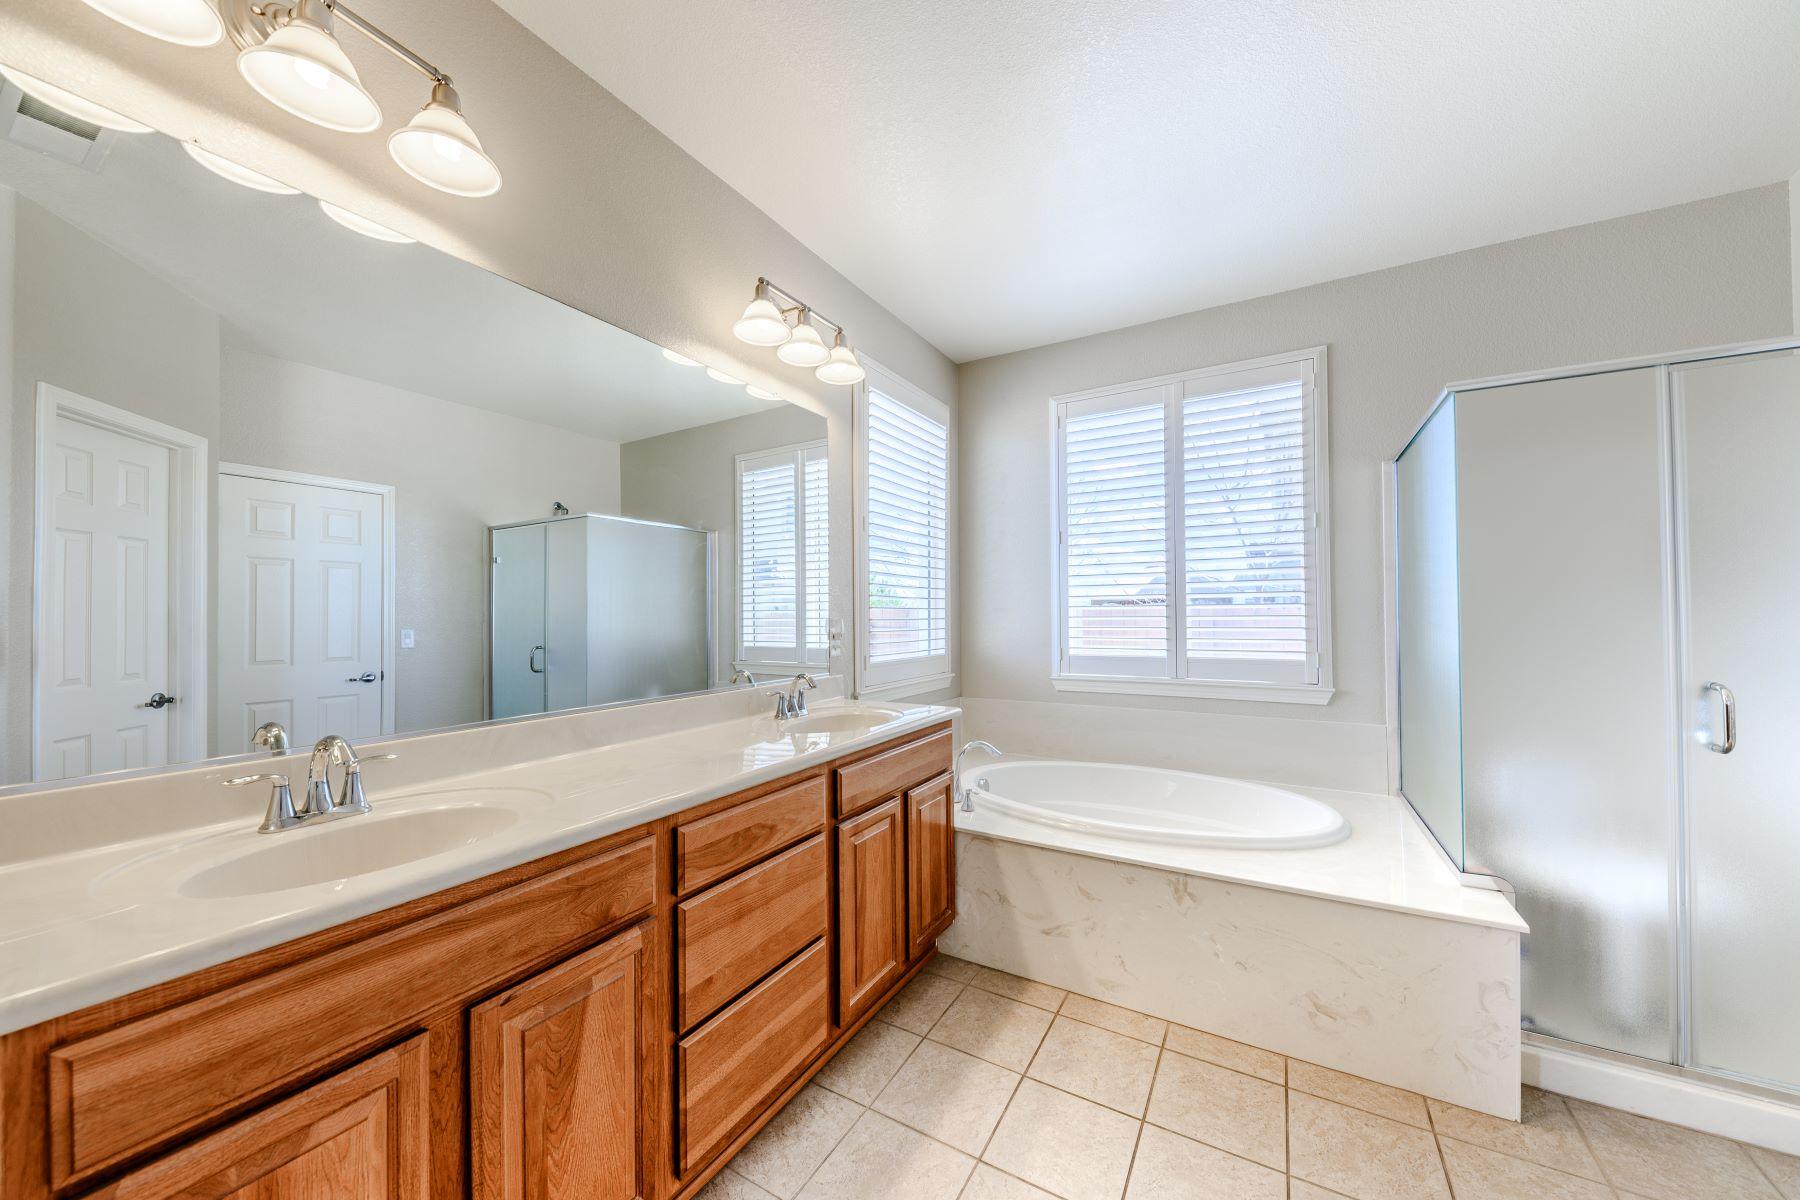 Additional photo for property listing at 1360 Sticklebract Drive, Sparks, Nevada 1360 Sticklebract Drive Sparks, Nevada 89441 Estados Unidos